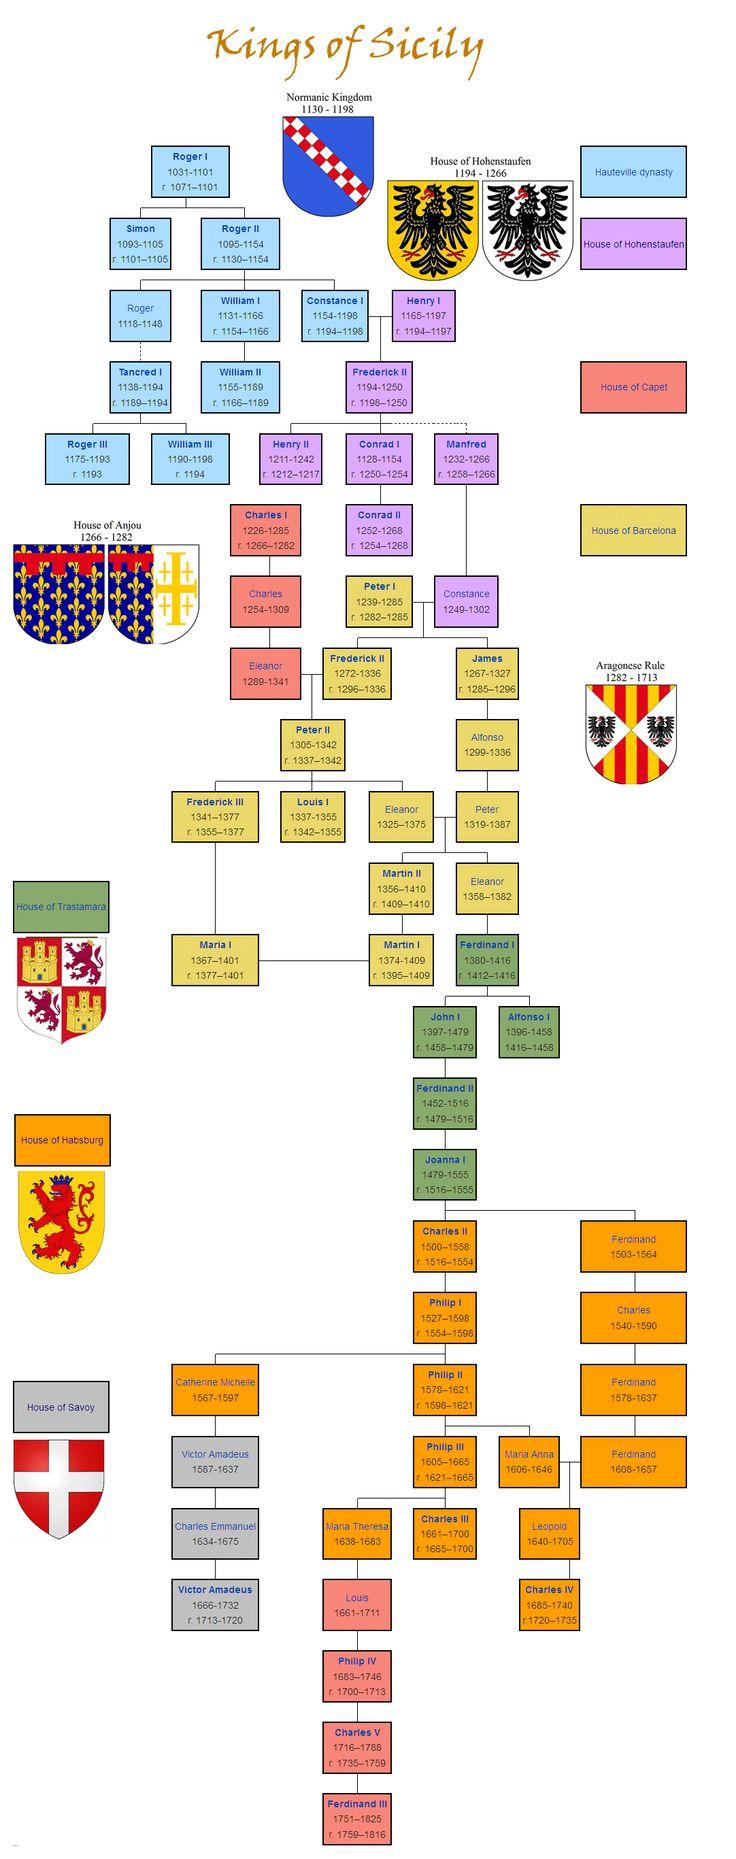 [Italy] Kings of Sicily http://en.wikipedia.org/wiki/Kings_of_Sicily_family_tree